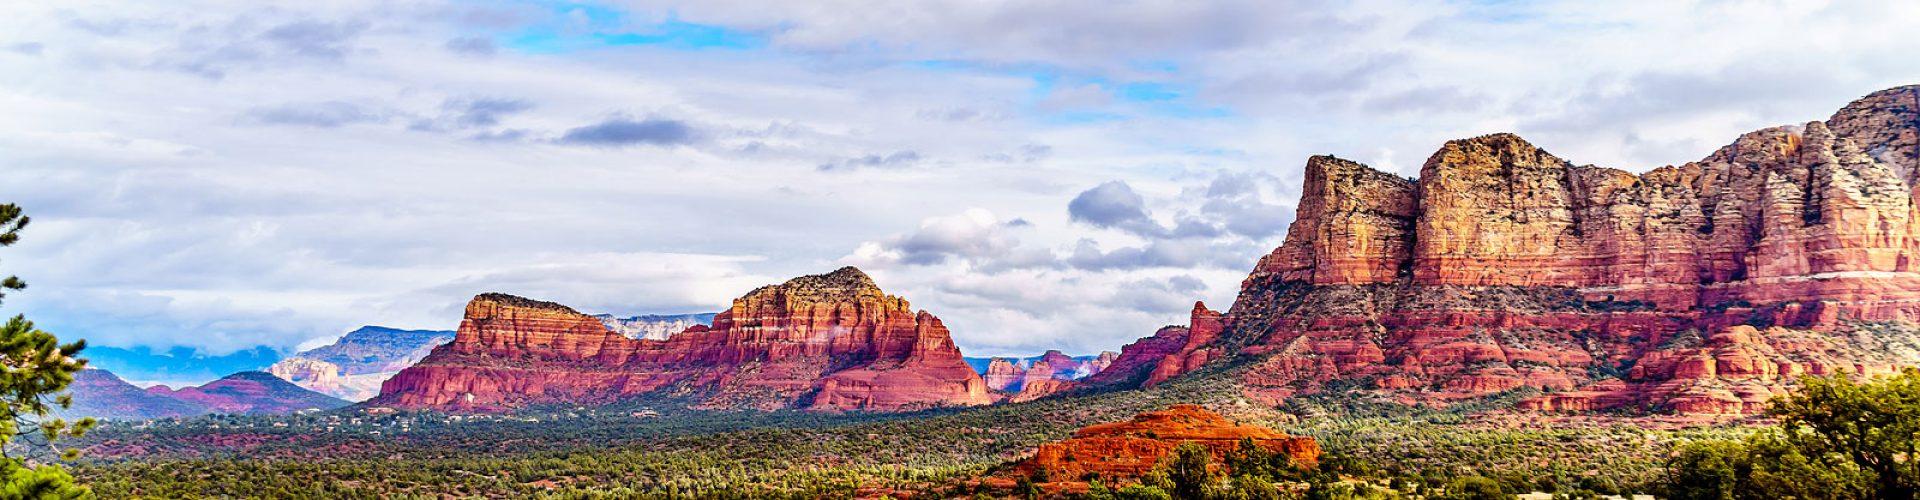 BainLawFirm-Northern-Arizona